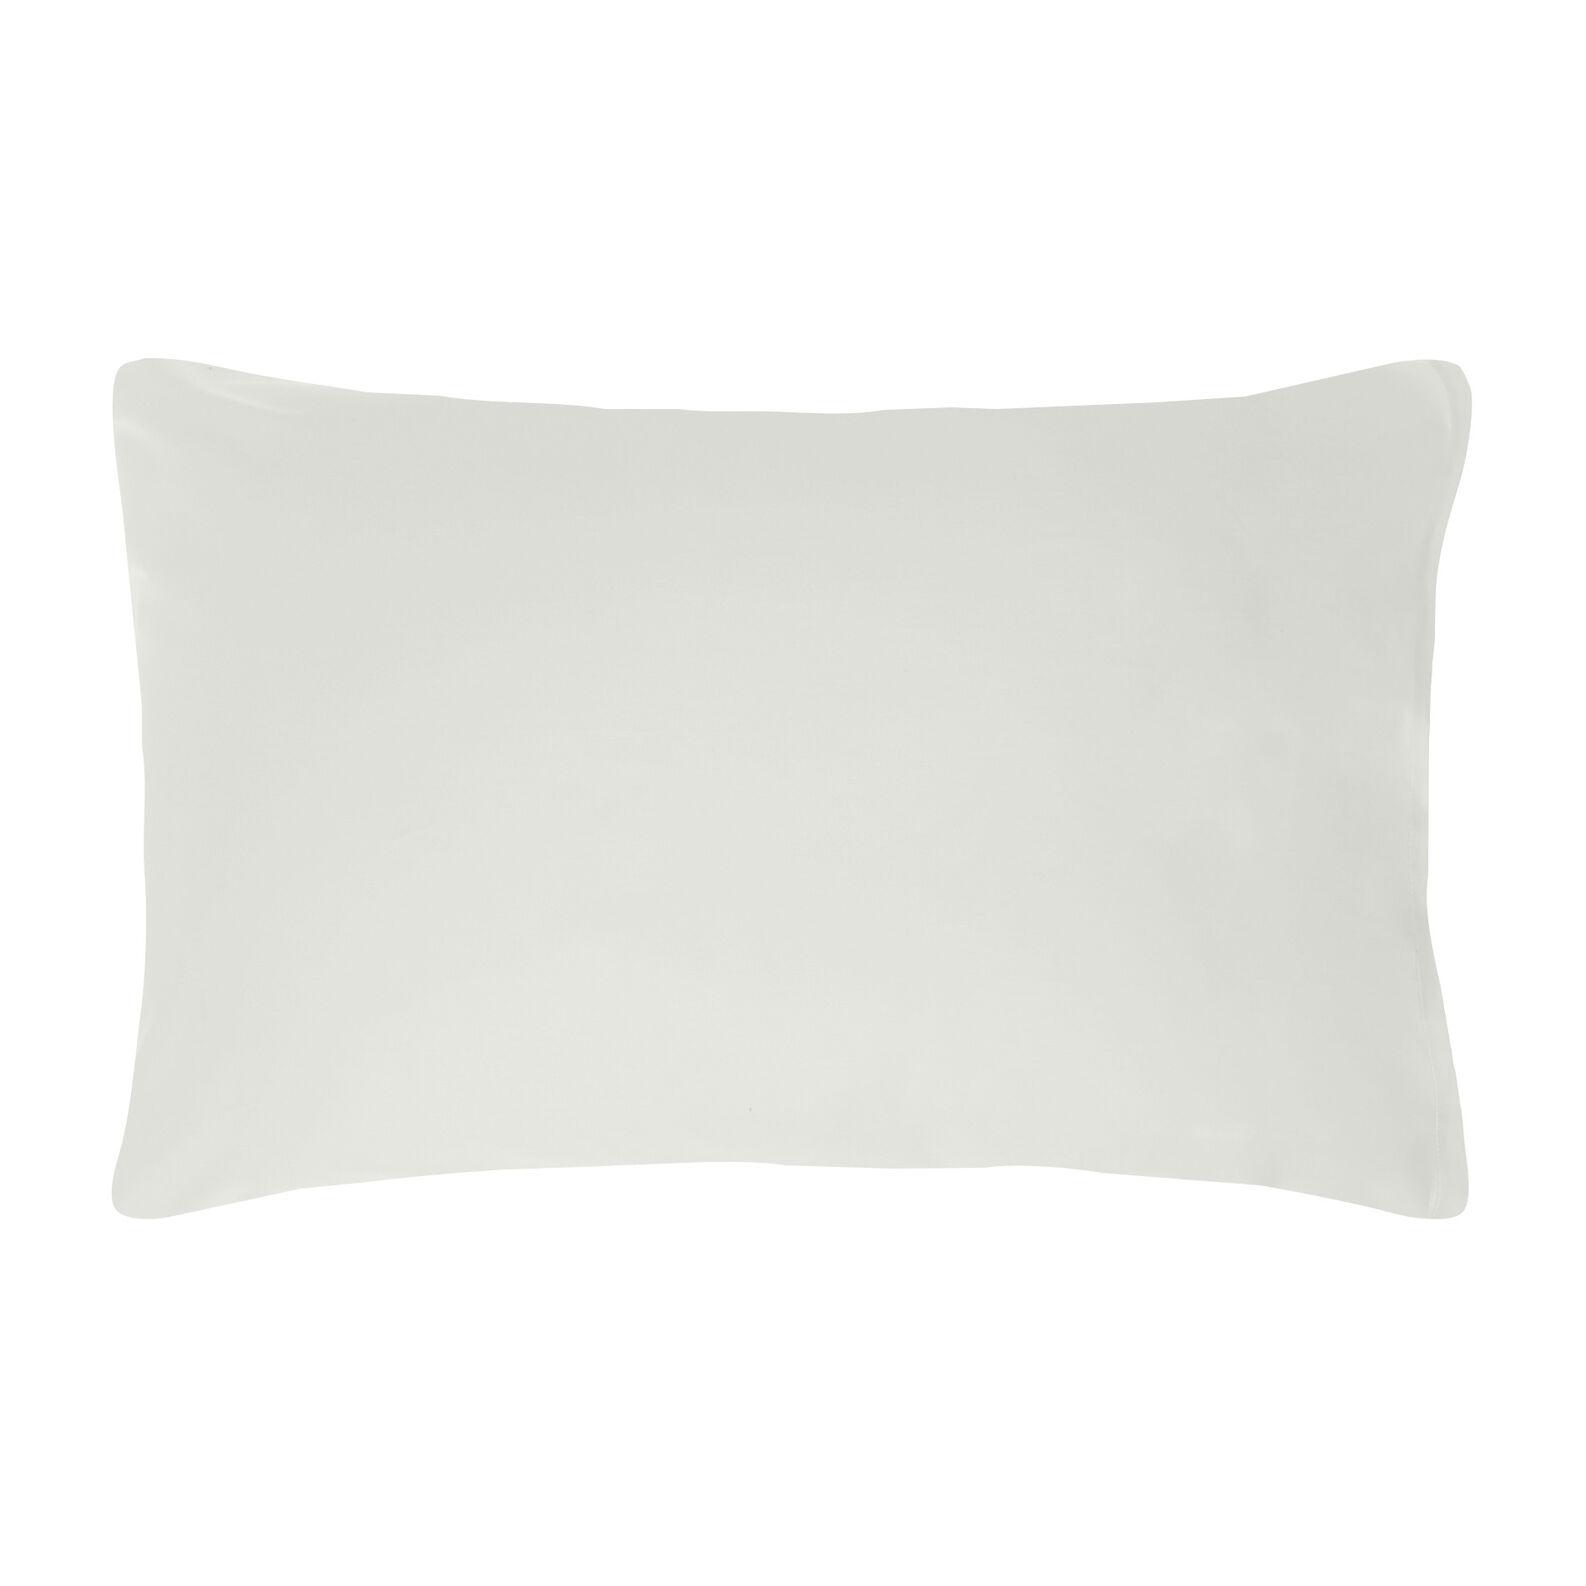 Zefiro 2-pack pillowcases in 100% cotton satin